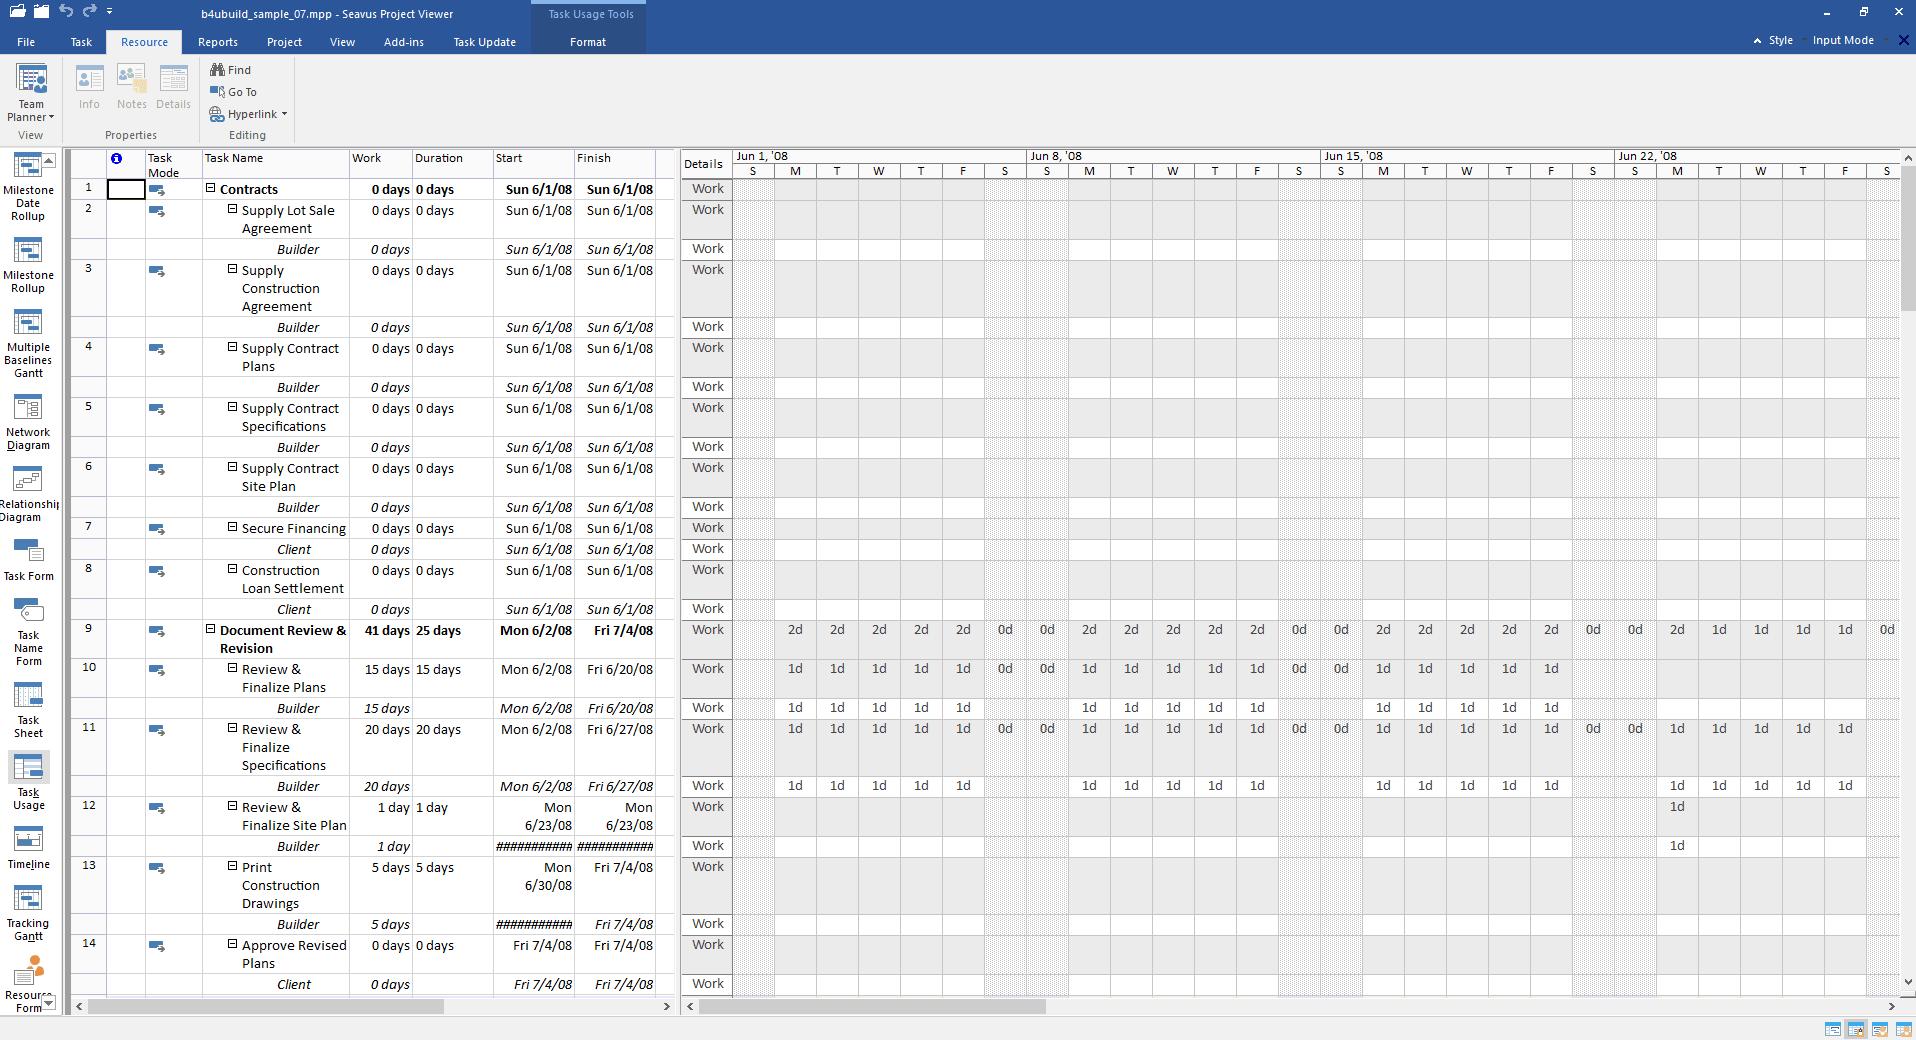 task-usage